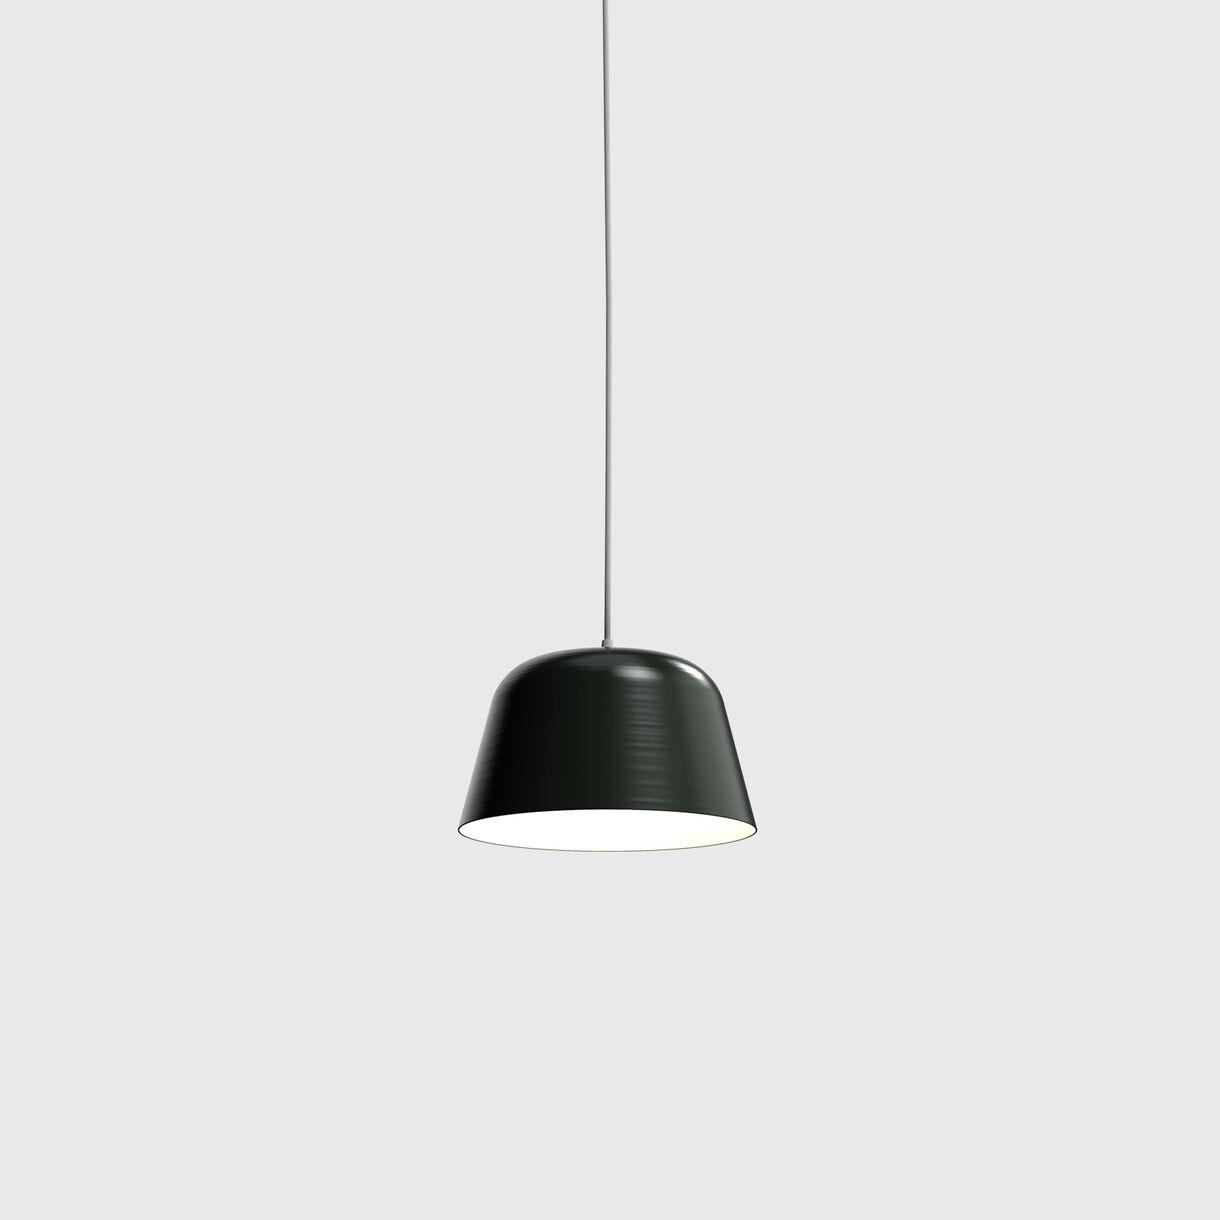 Bolet Pendant Light, Black, Small